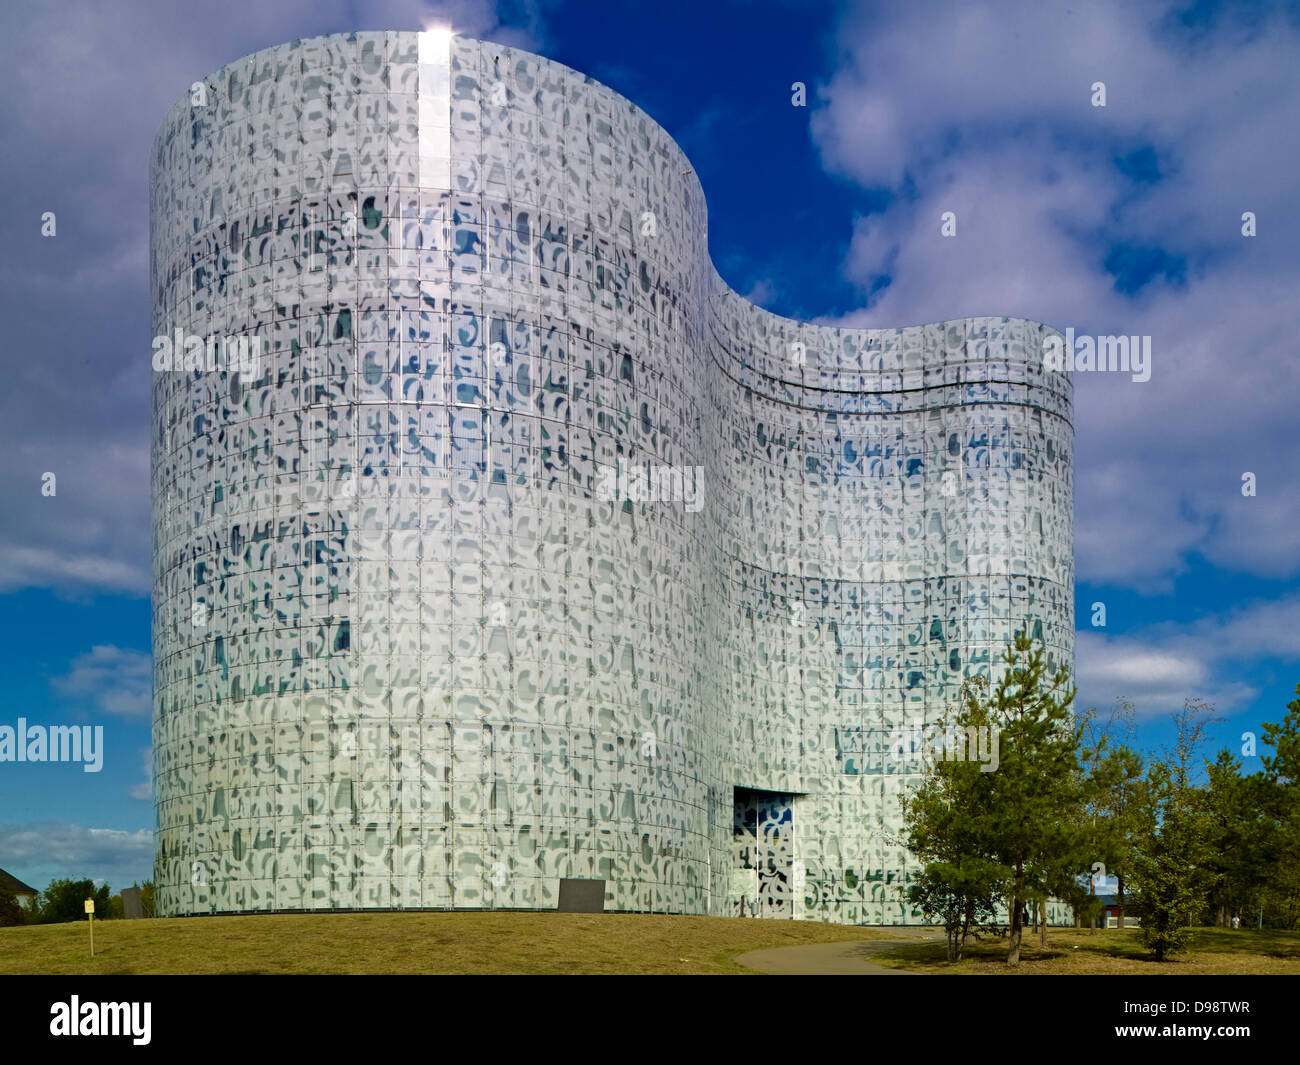 Information, Communication and Media Centre in Cottbus, Brandenburg, Germany - Stock Image